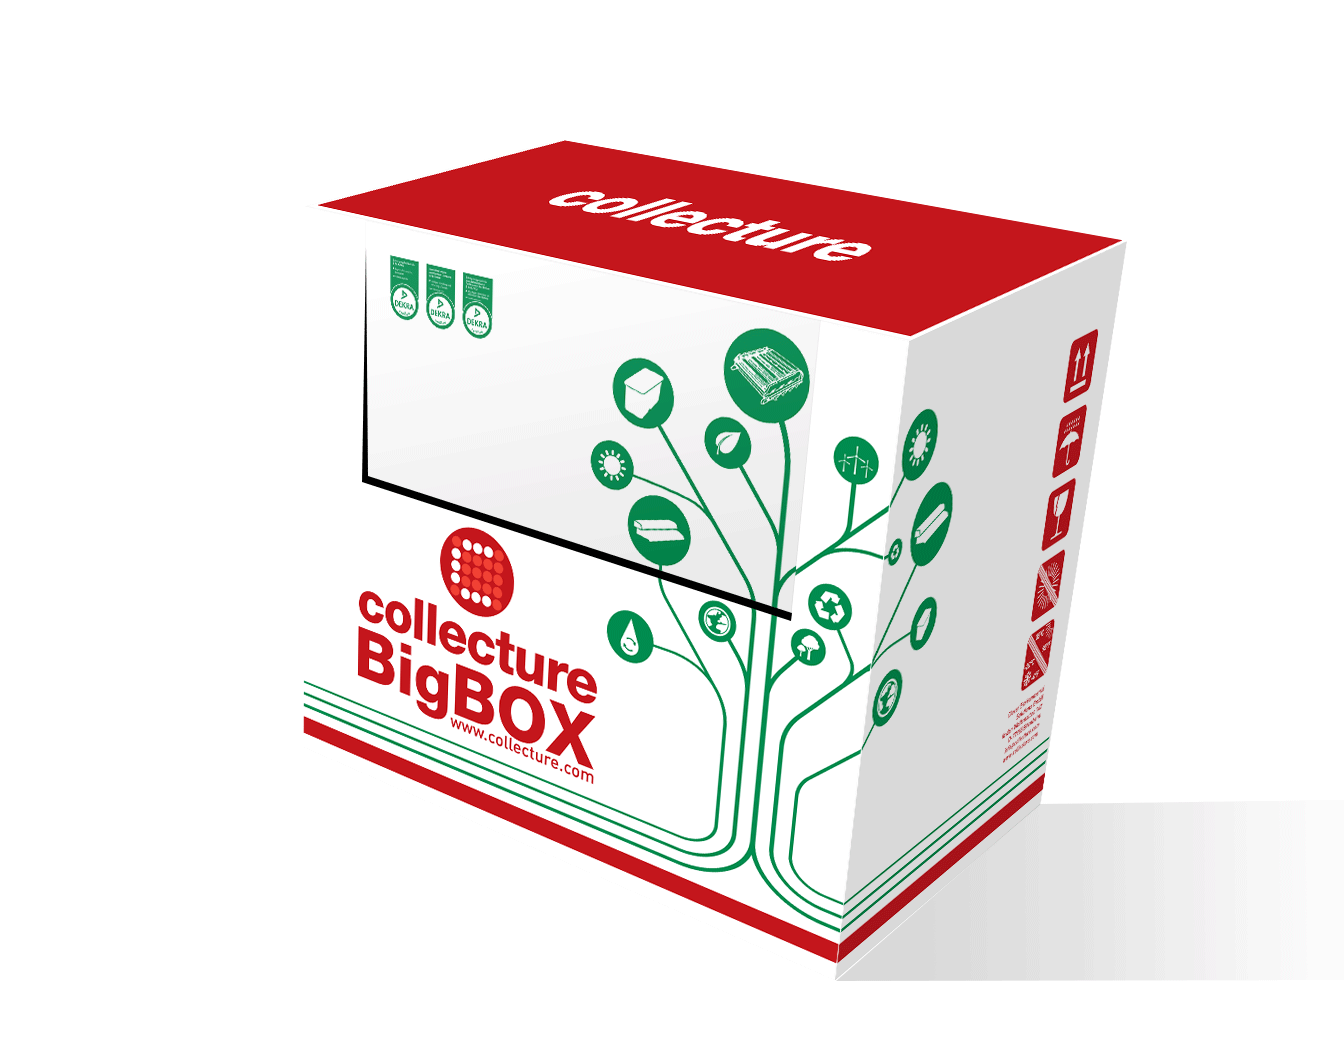 3D Box - Big Box Print